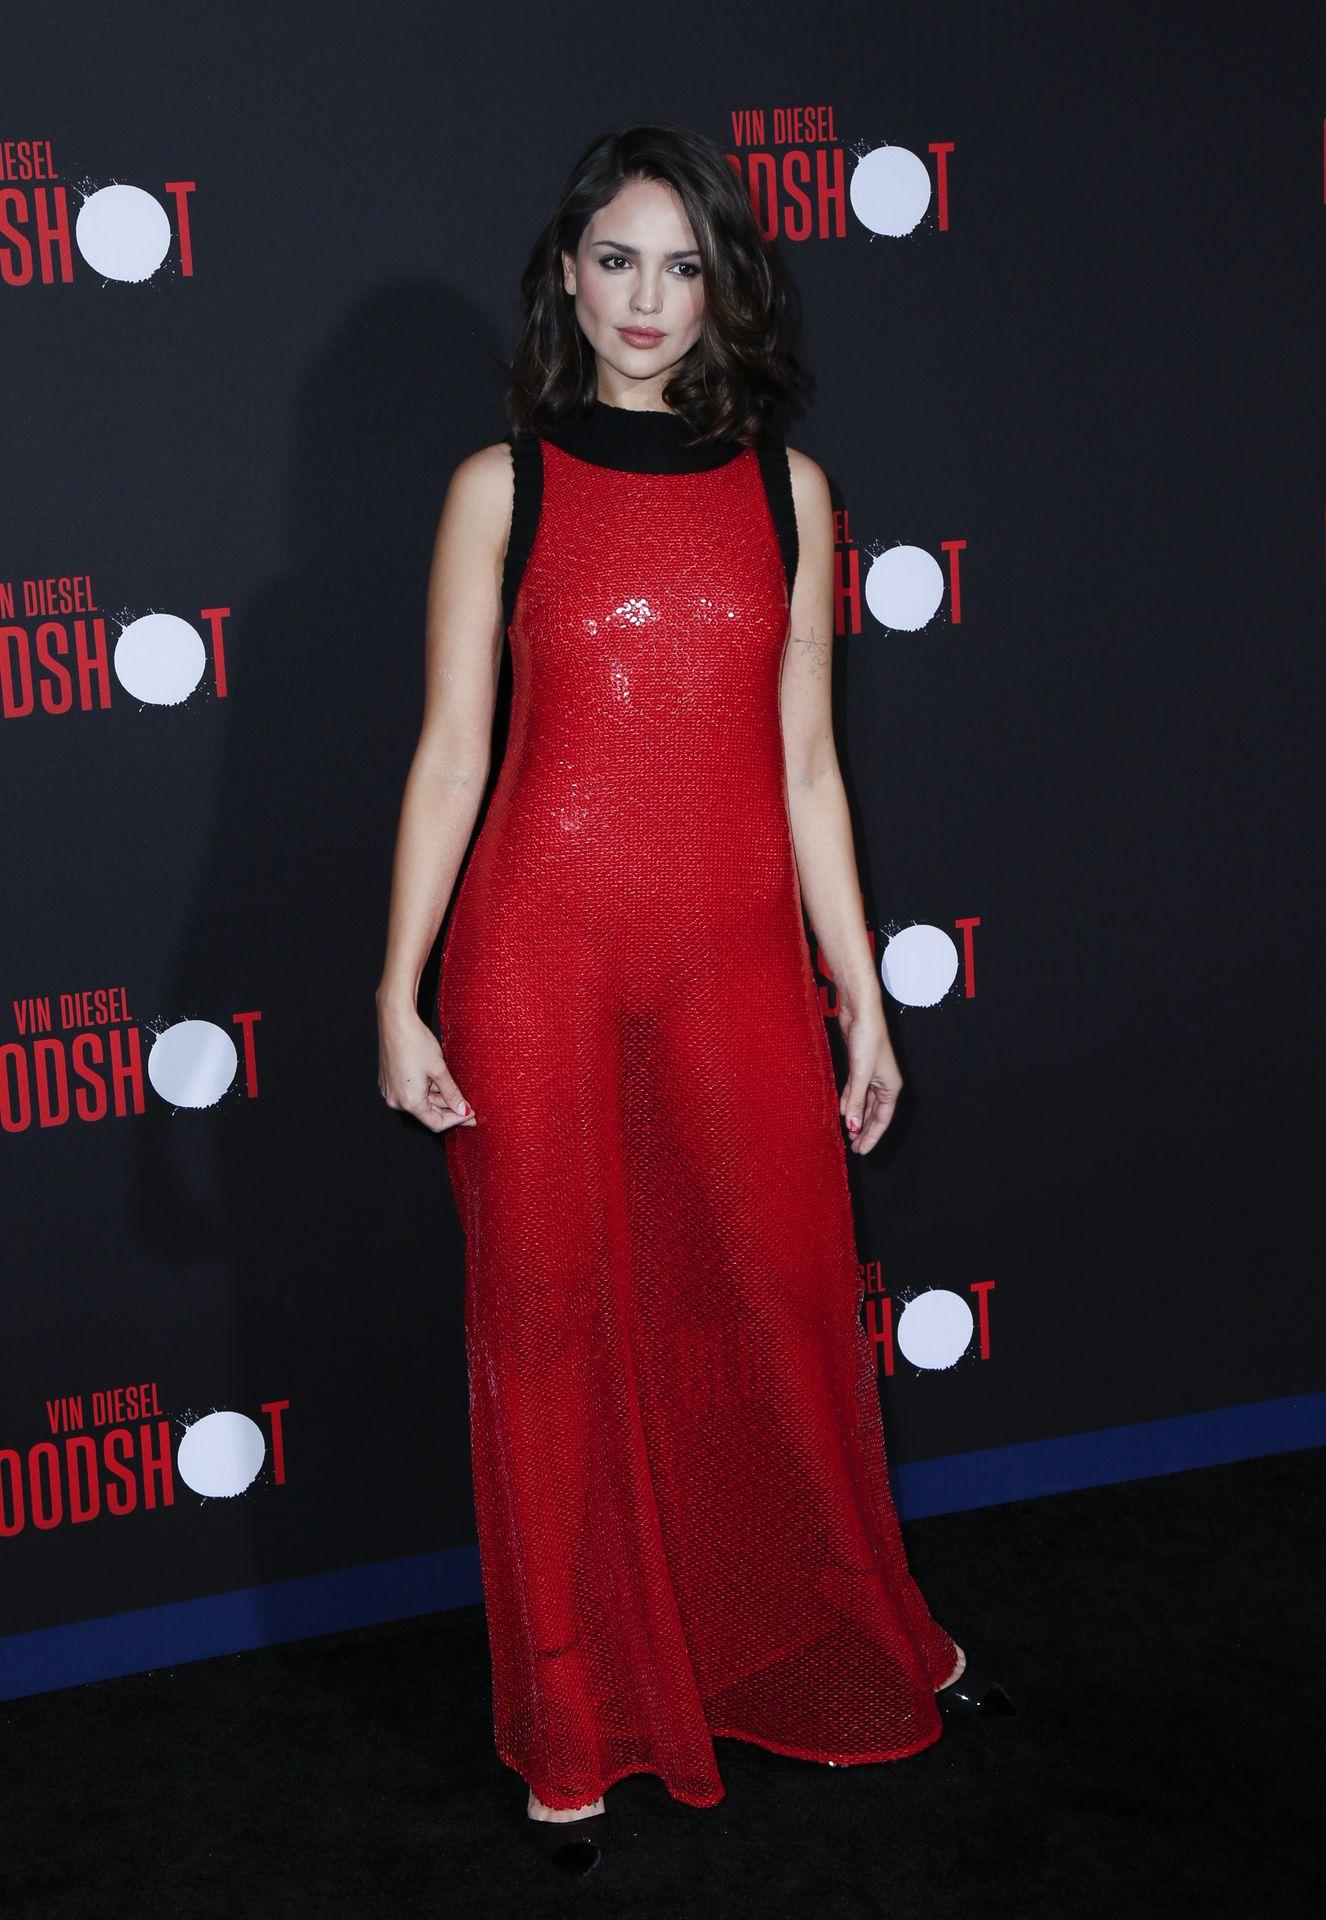 Eiza Gonzalez Stuns in a Red Dress at the Bloodshot